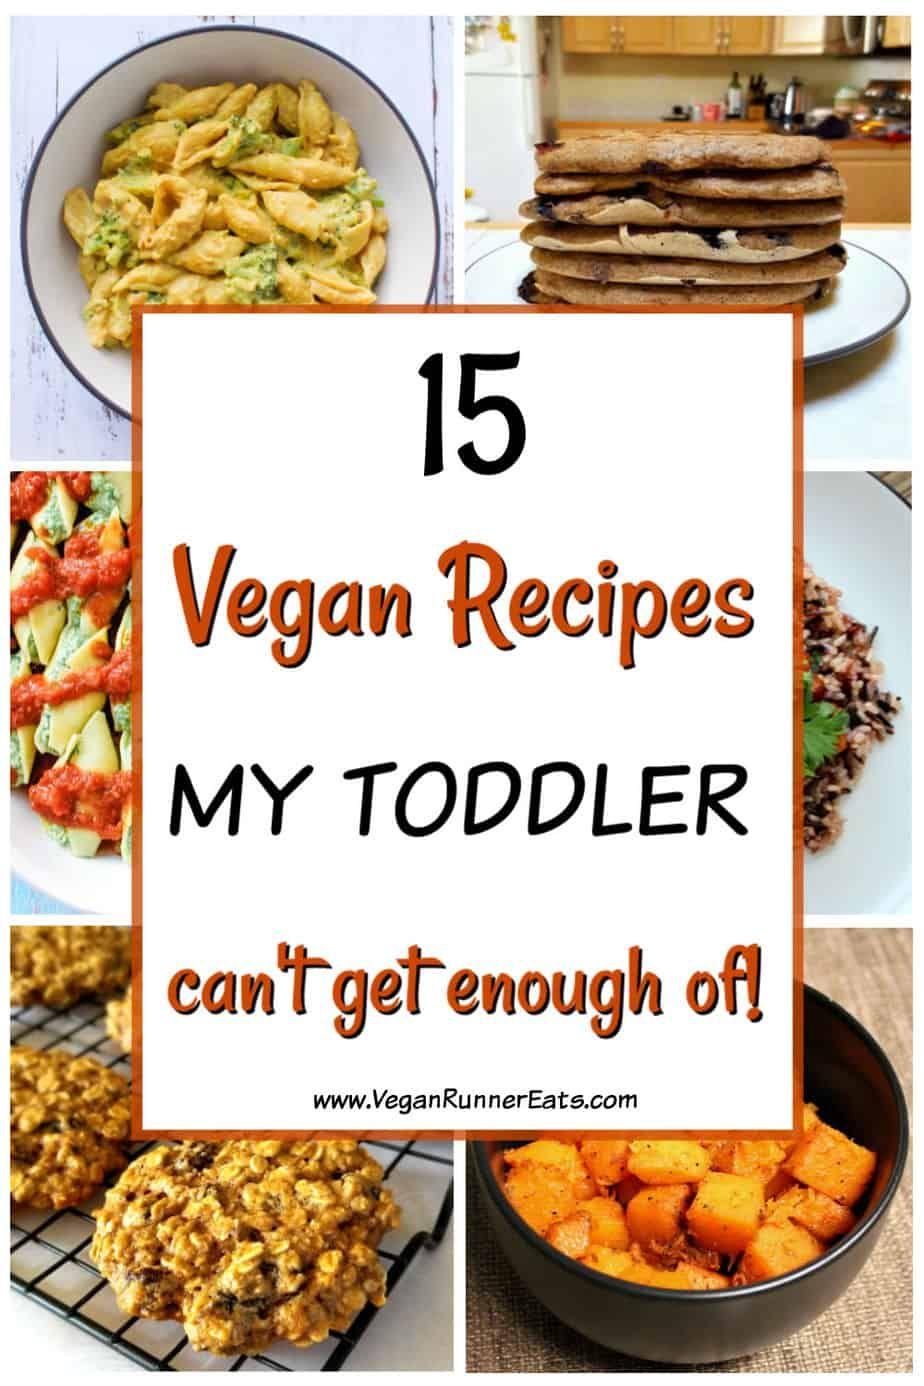 50 Unbelievable Veggie Recipes For Vegetable Haters Picky Eaters Recipes For Vegetable Haters Vegetarian Recipes Healthy Veggie Recipes